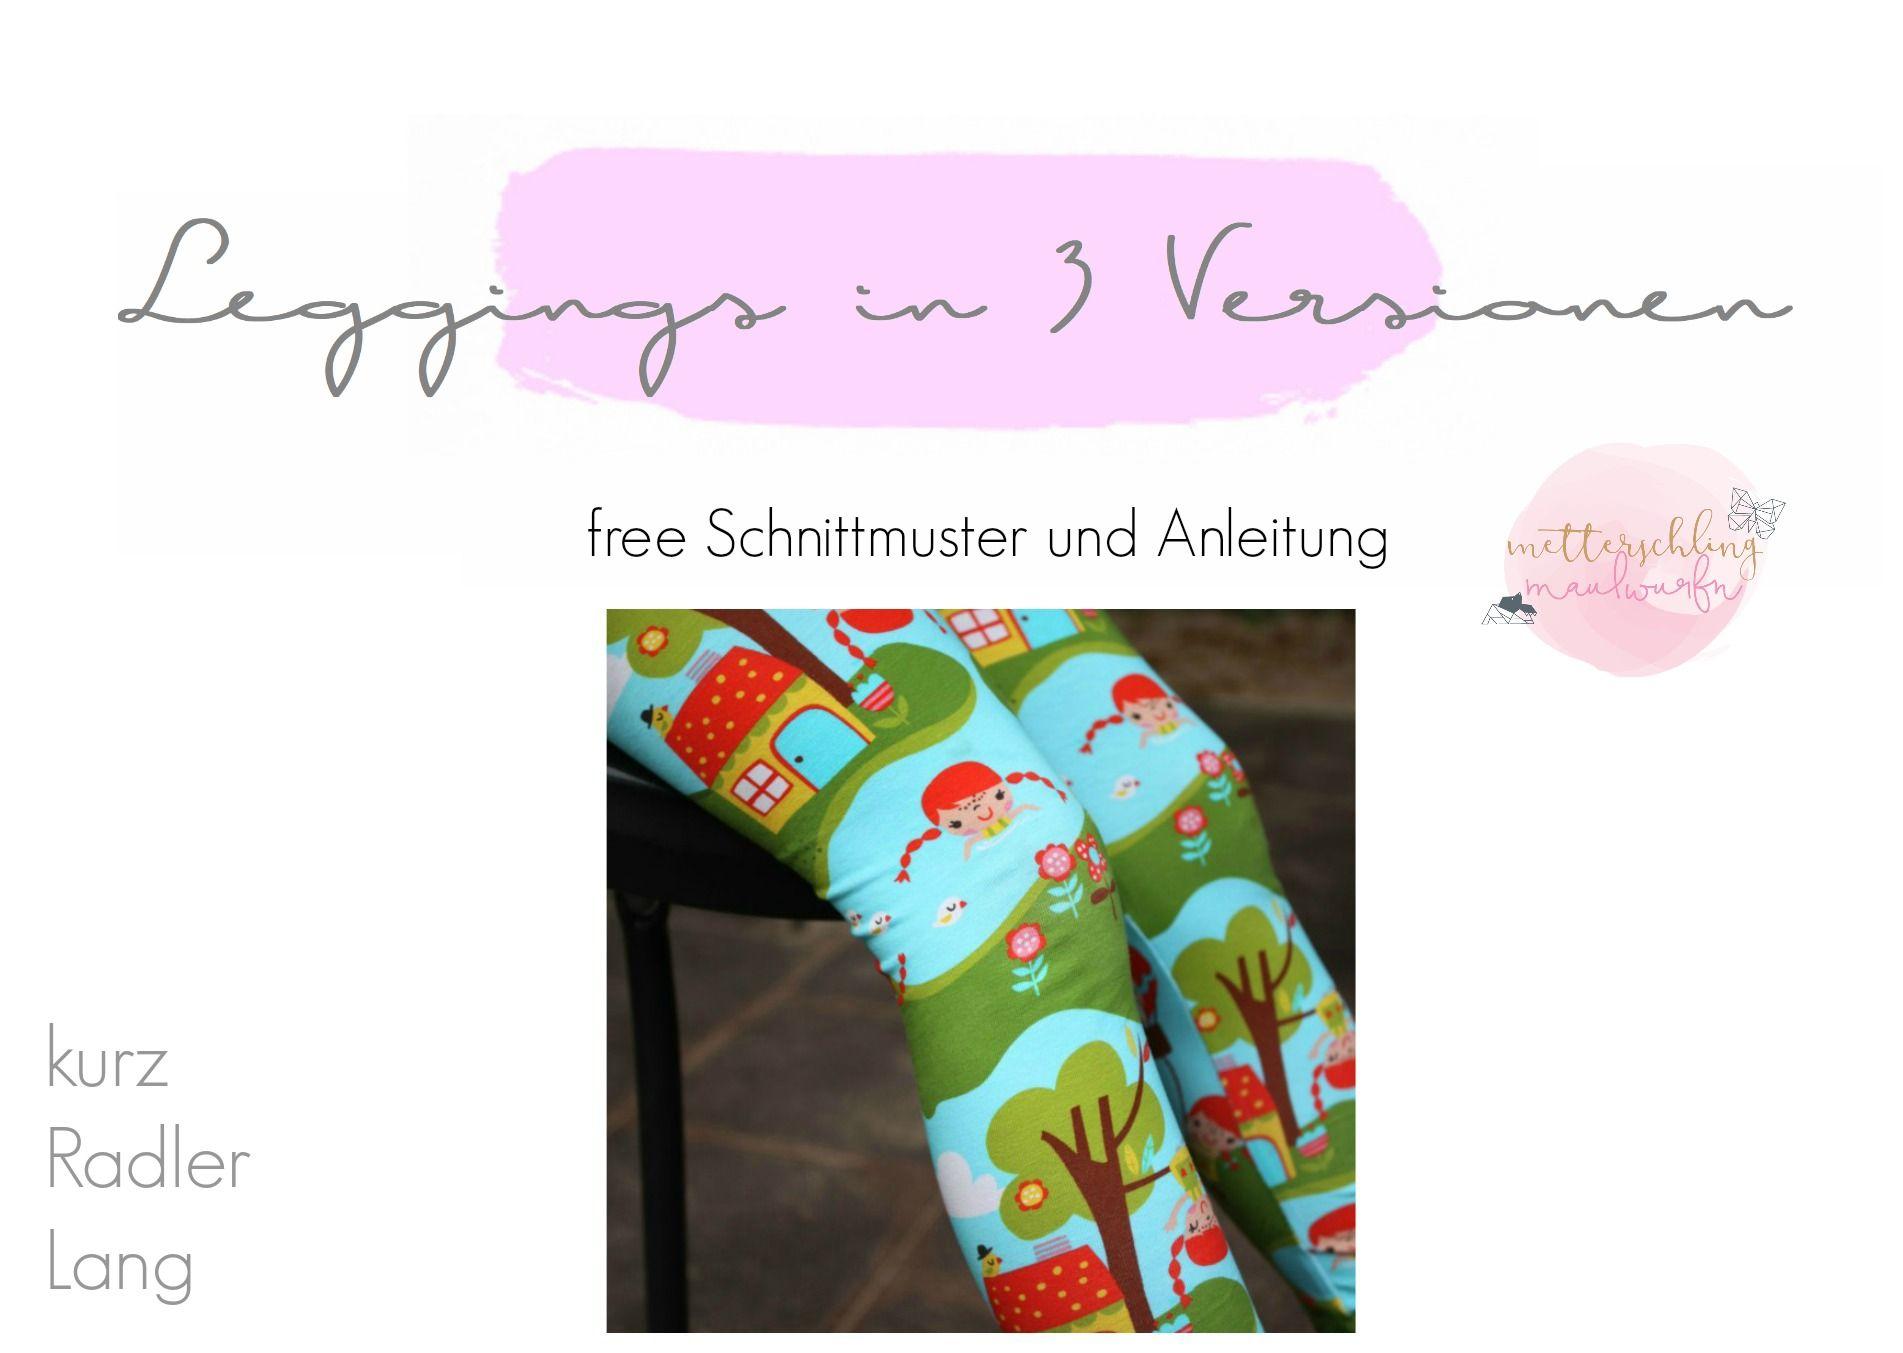 leggings, nähen, lernen, anleitung, free, schnittmuster, kostenlos ...